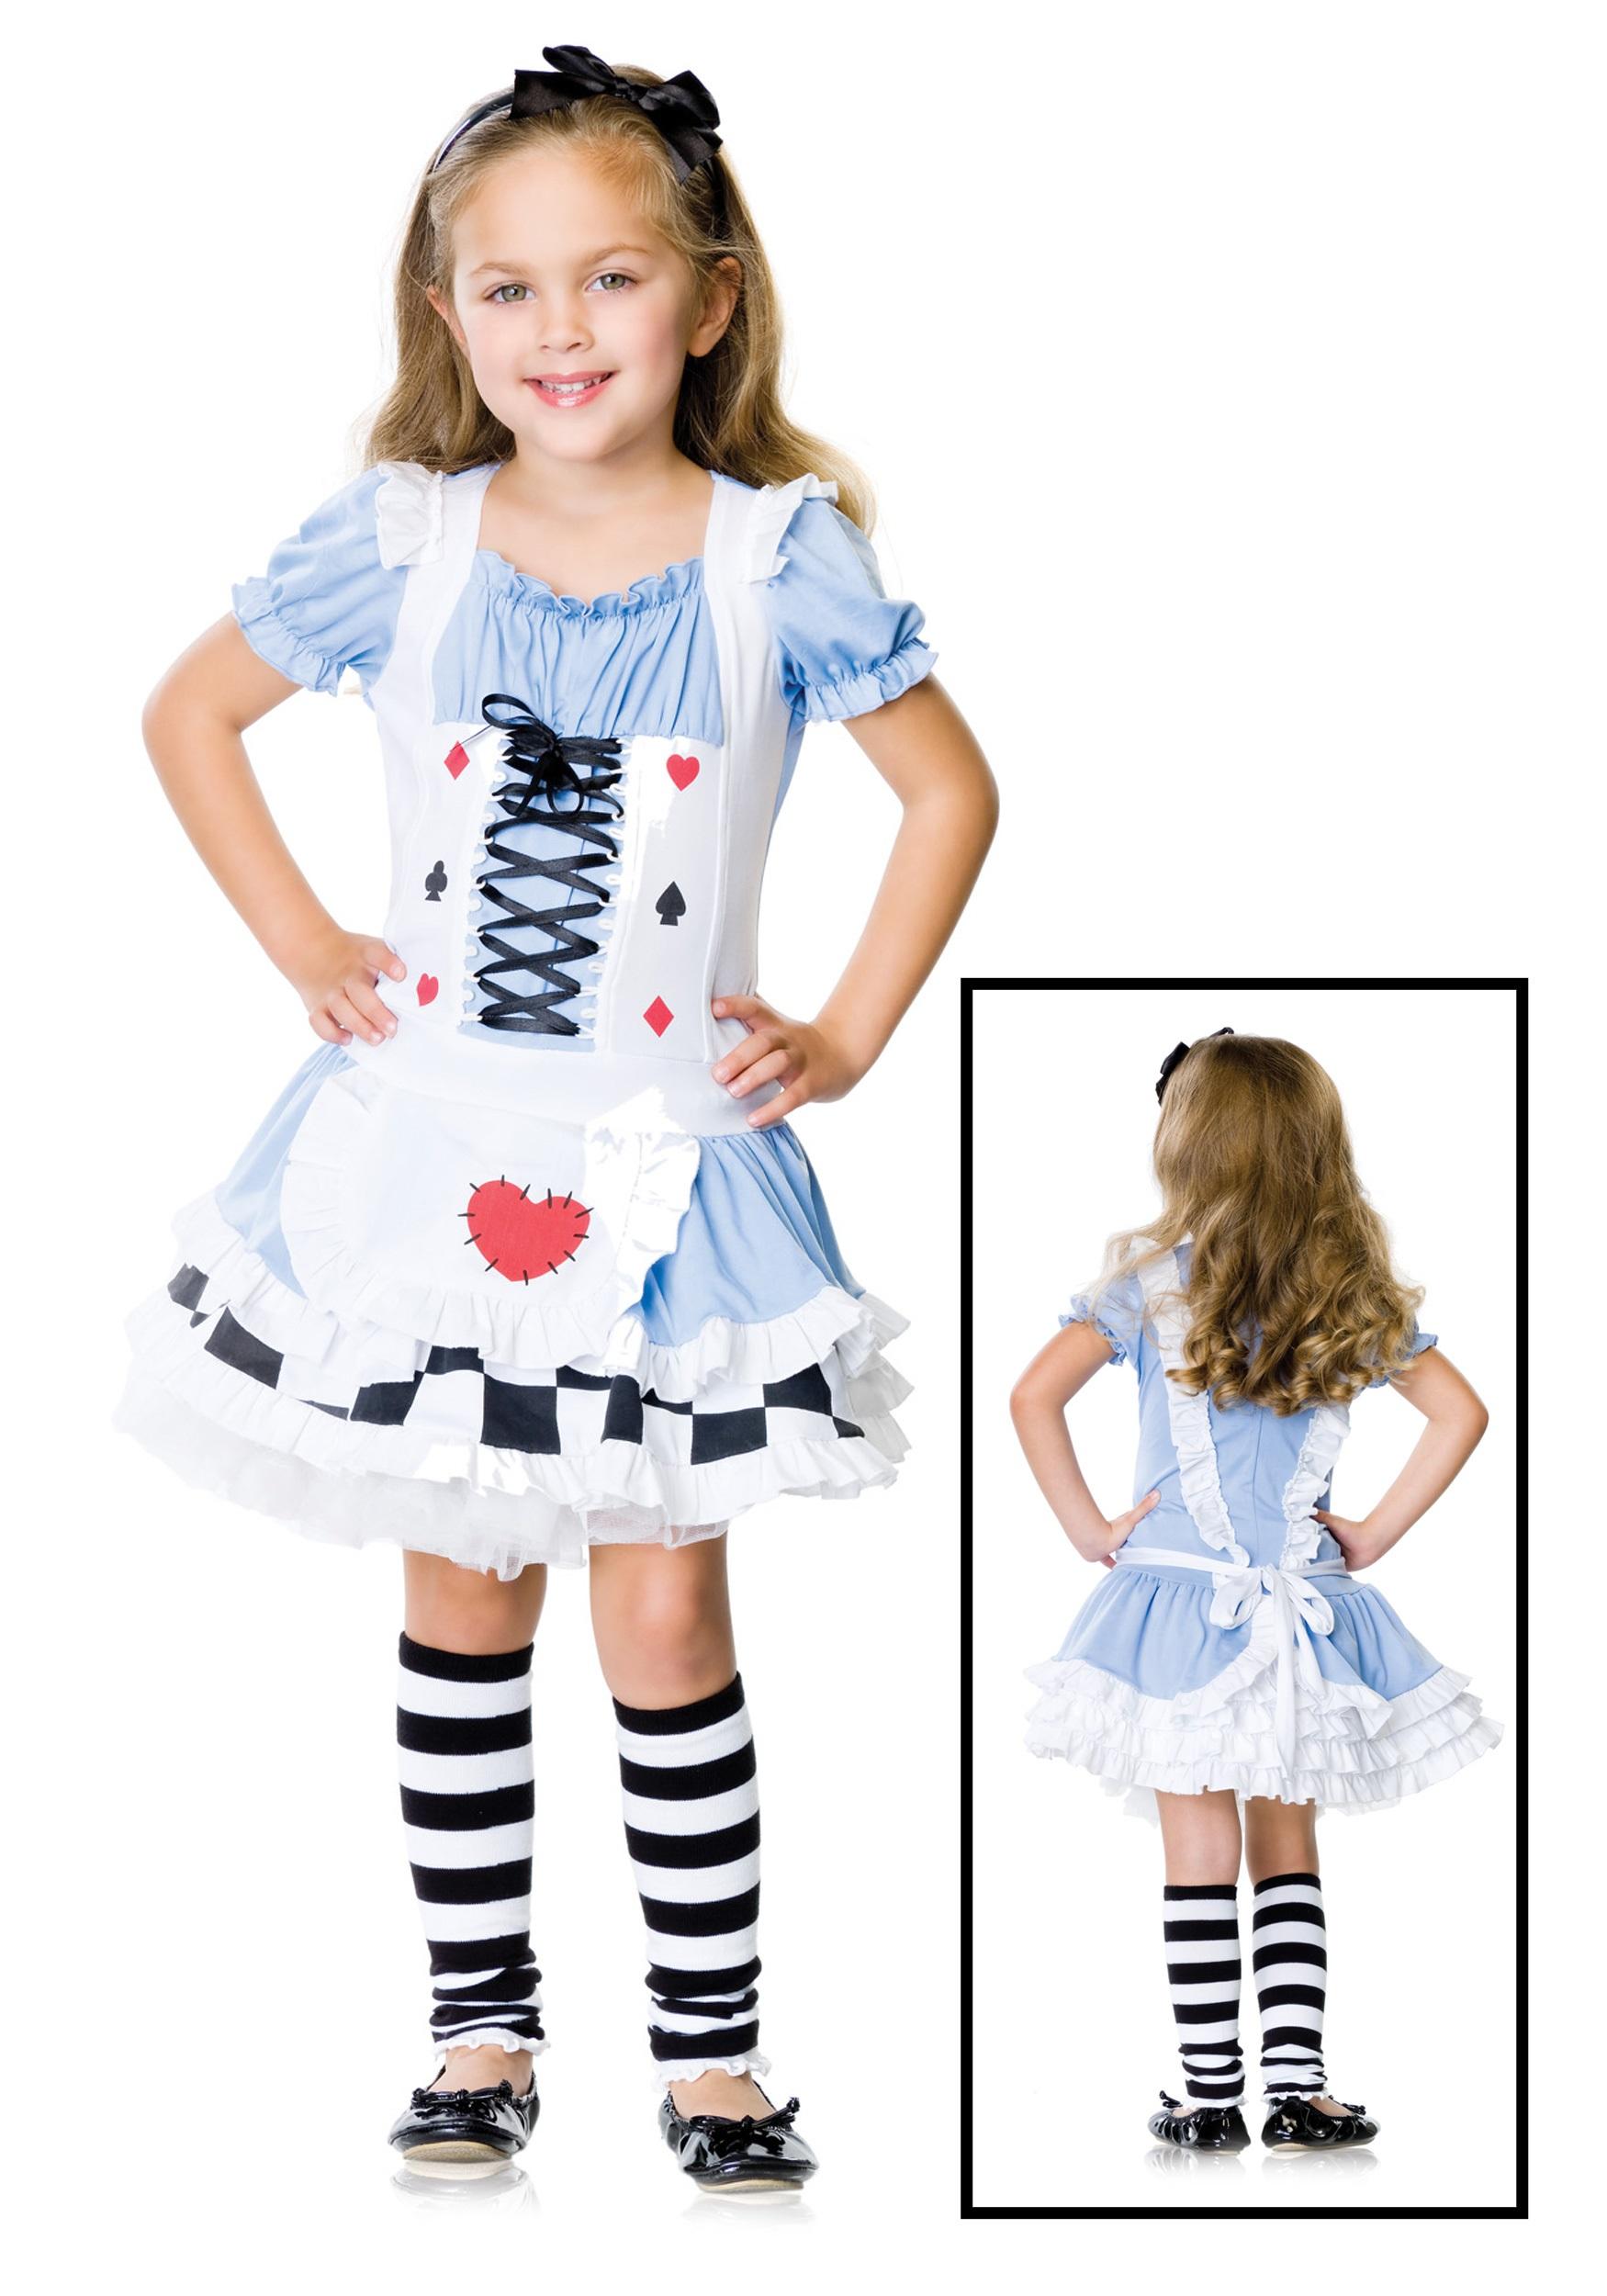 White apron alice wonderland costume - White Apron Alice Wonderland Costume 76